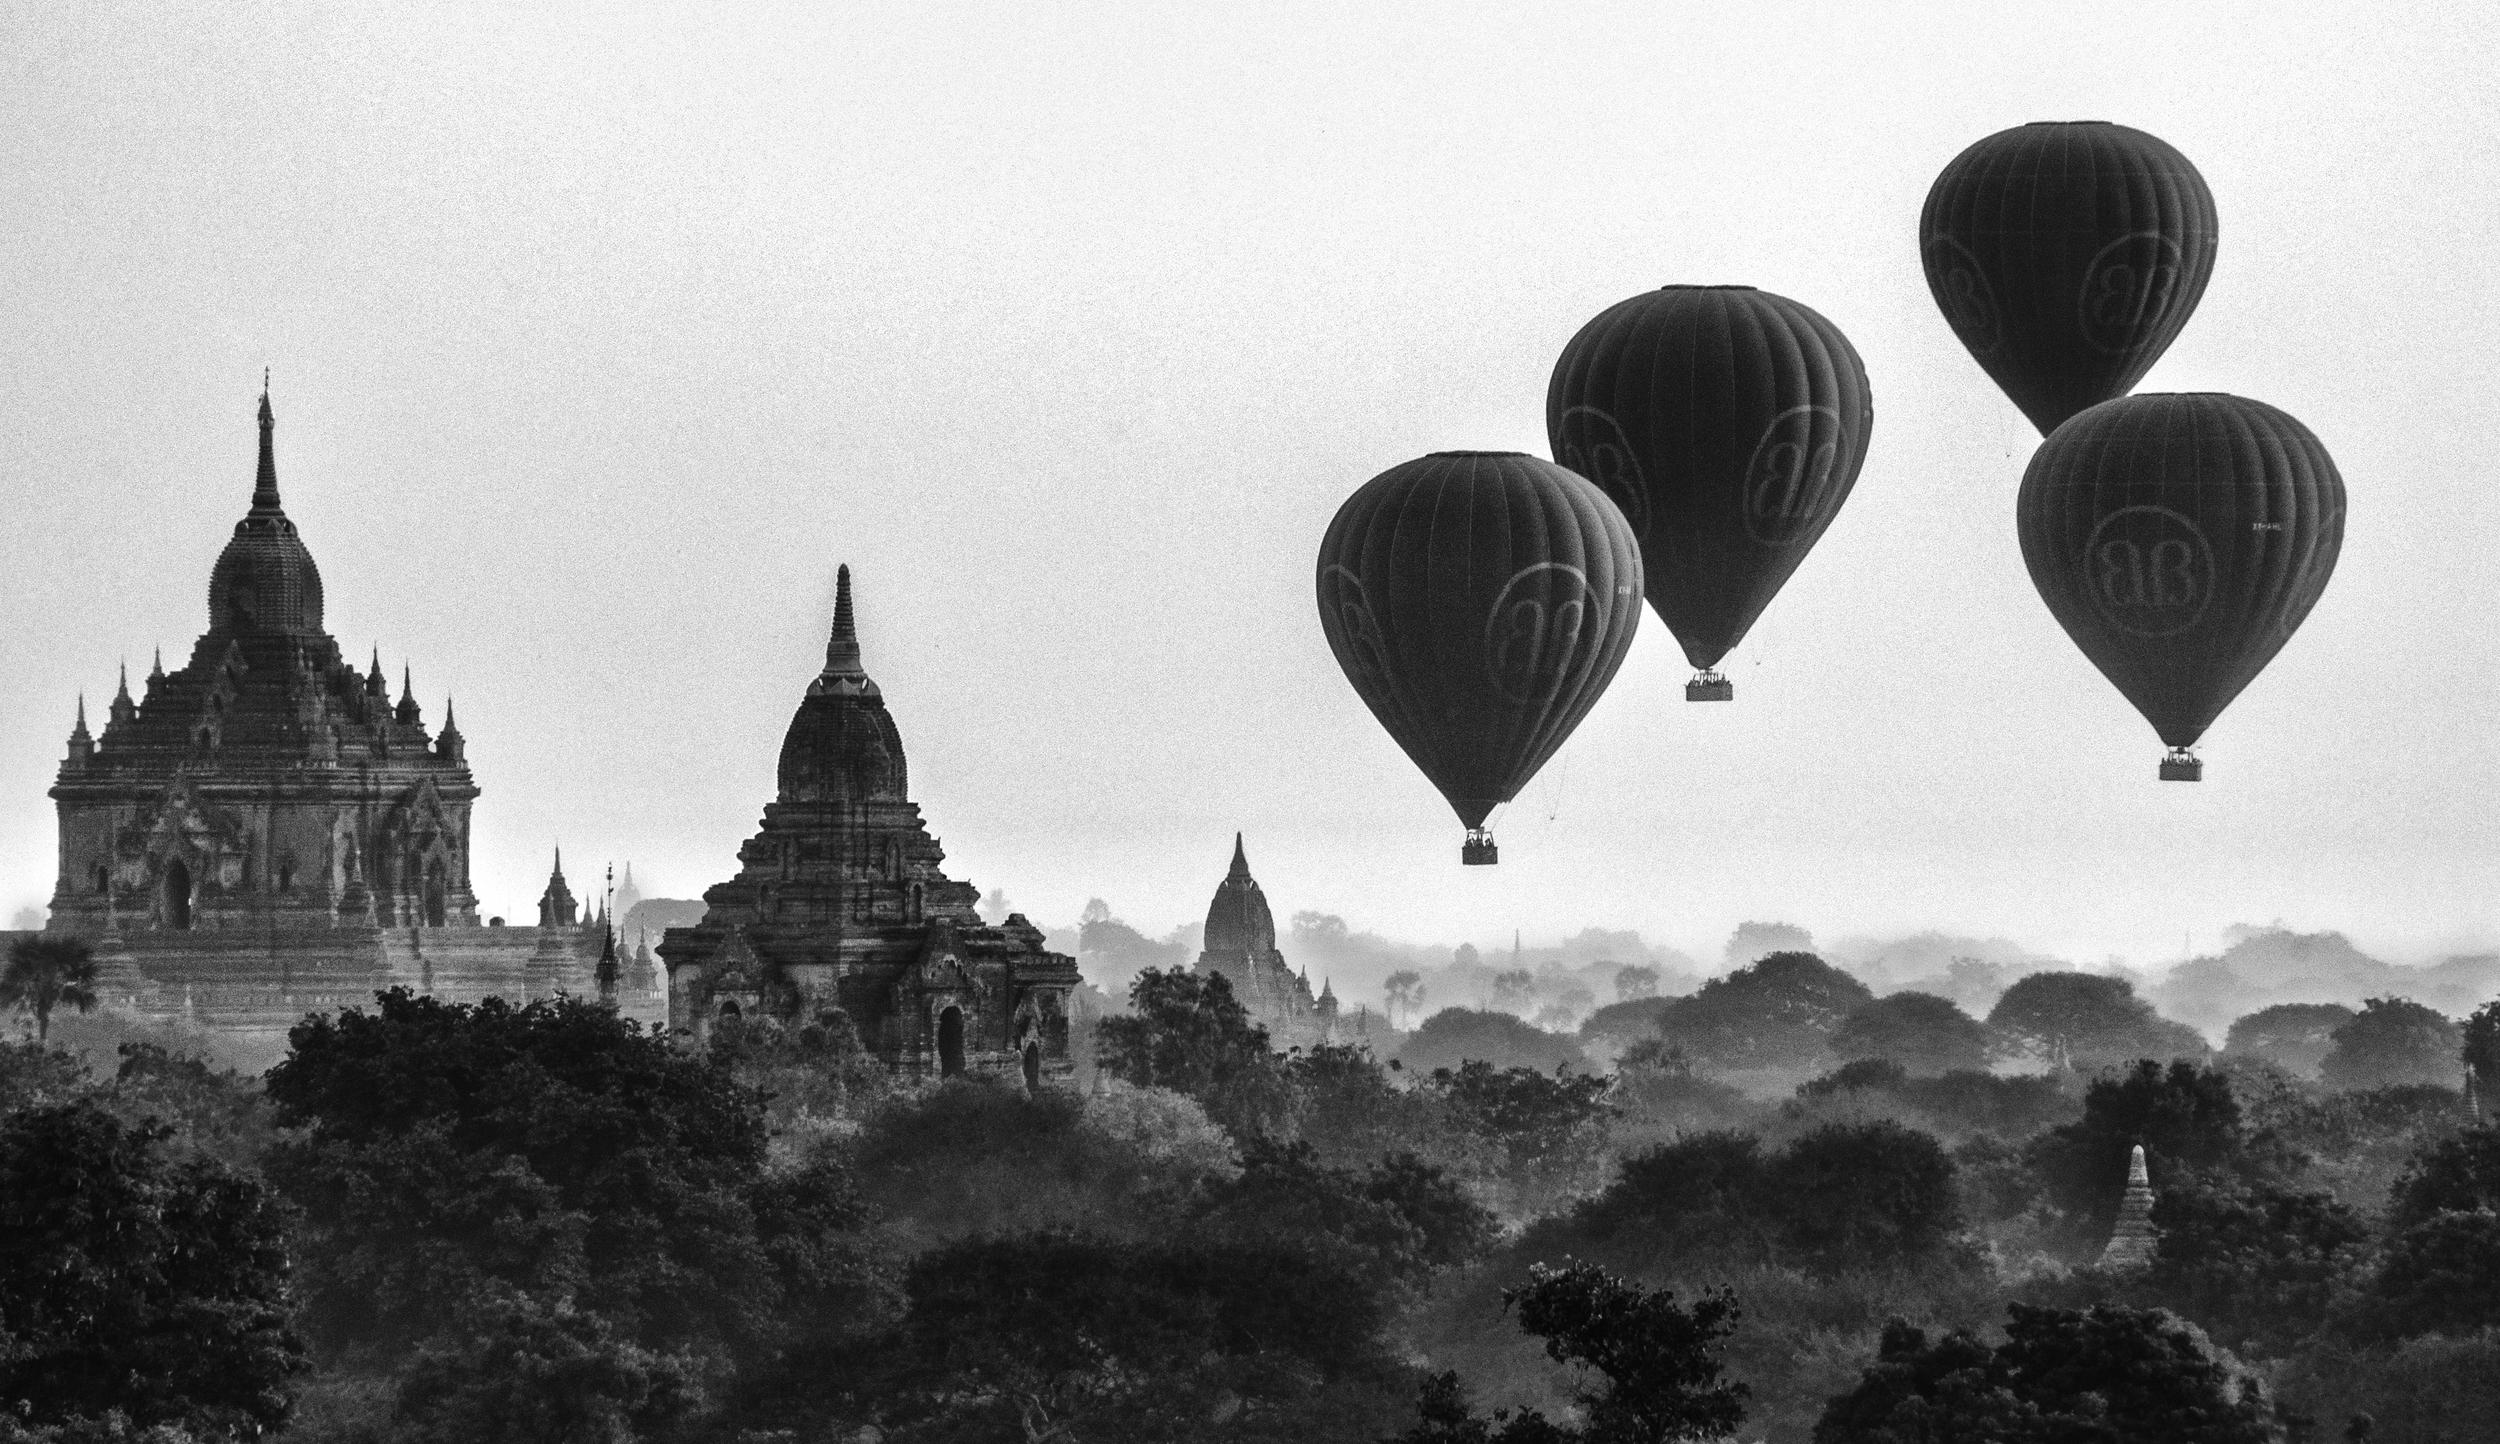 Balloons Over Bagan.jpg